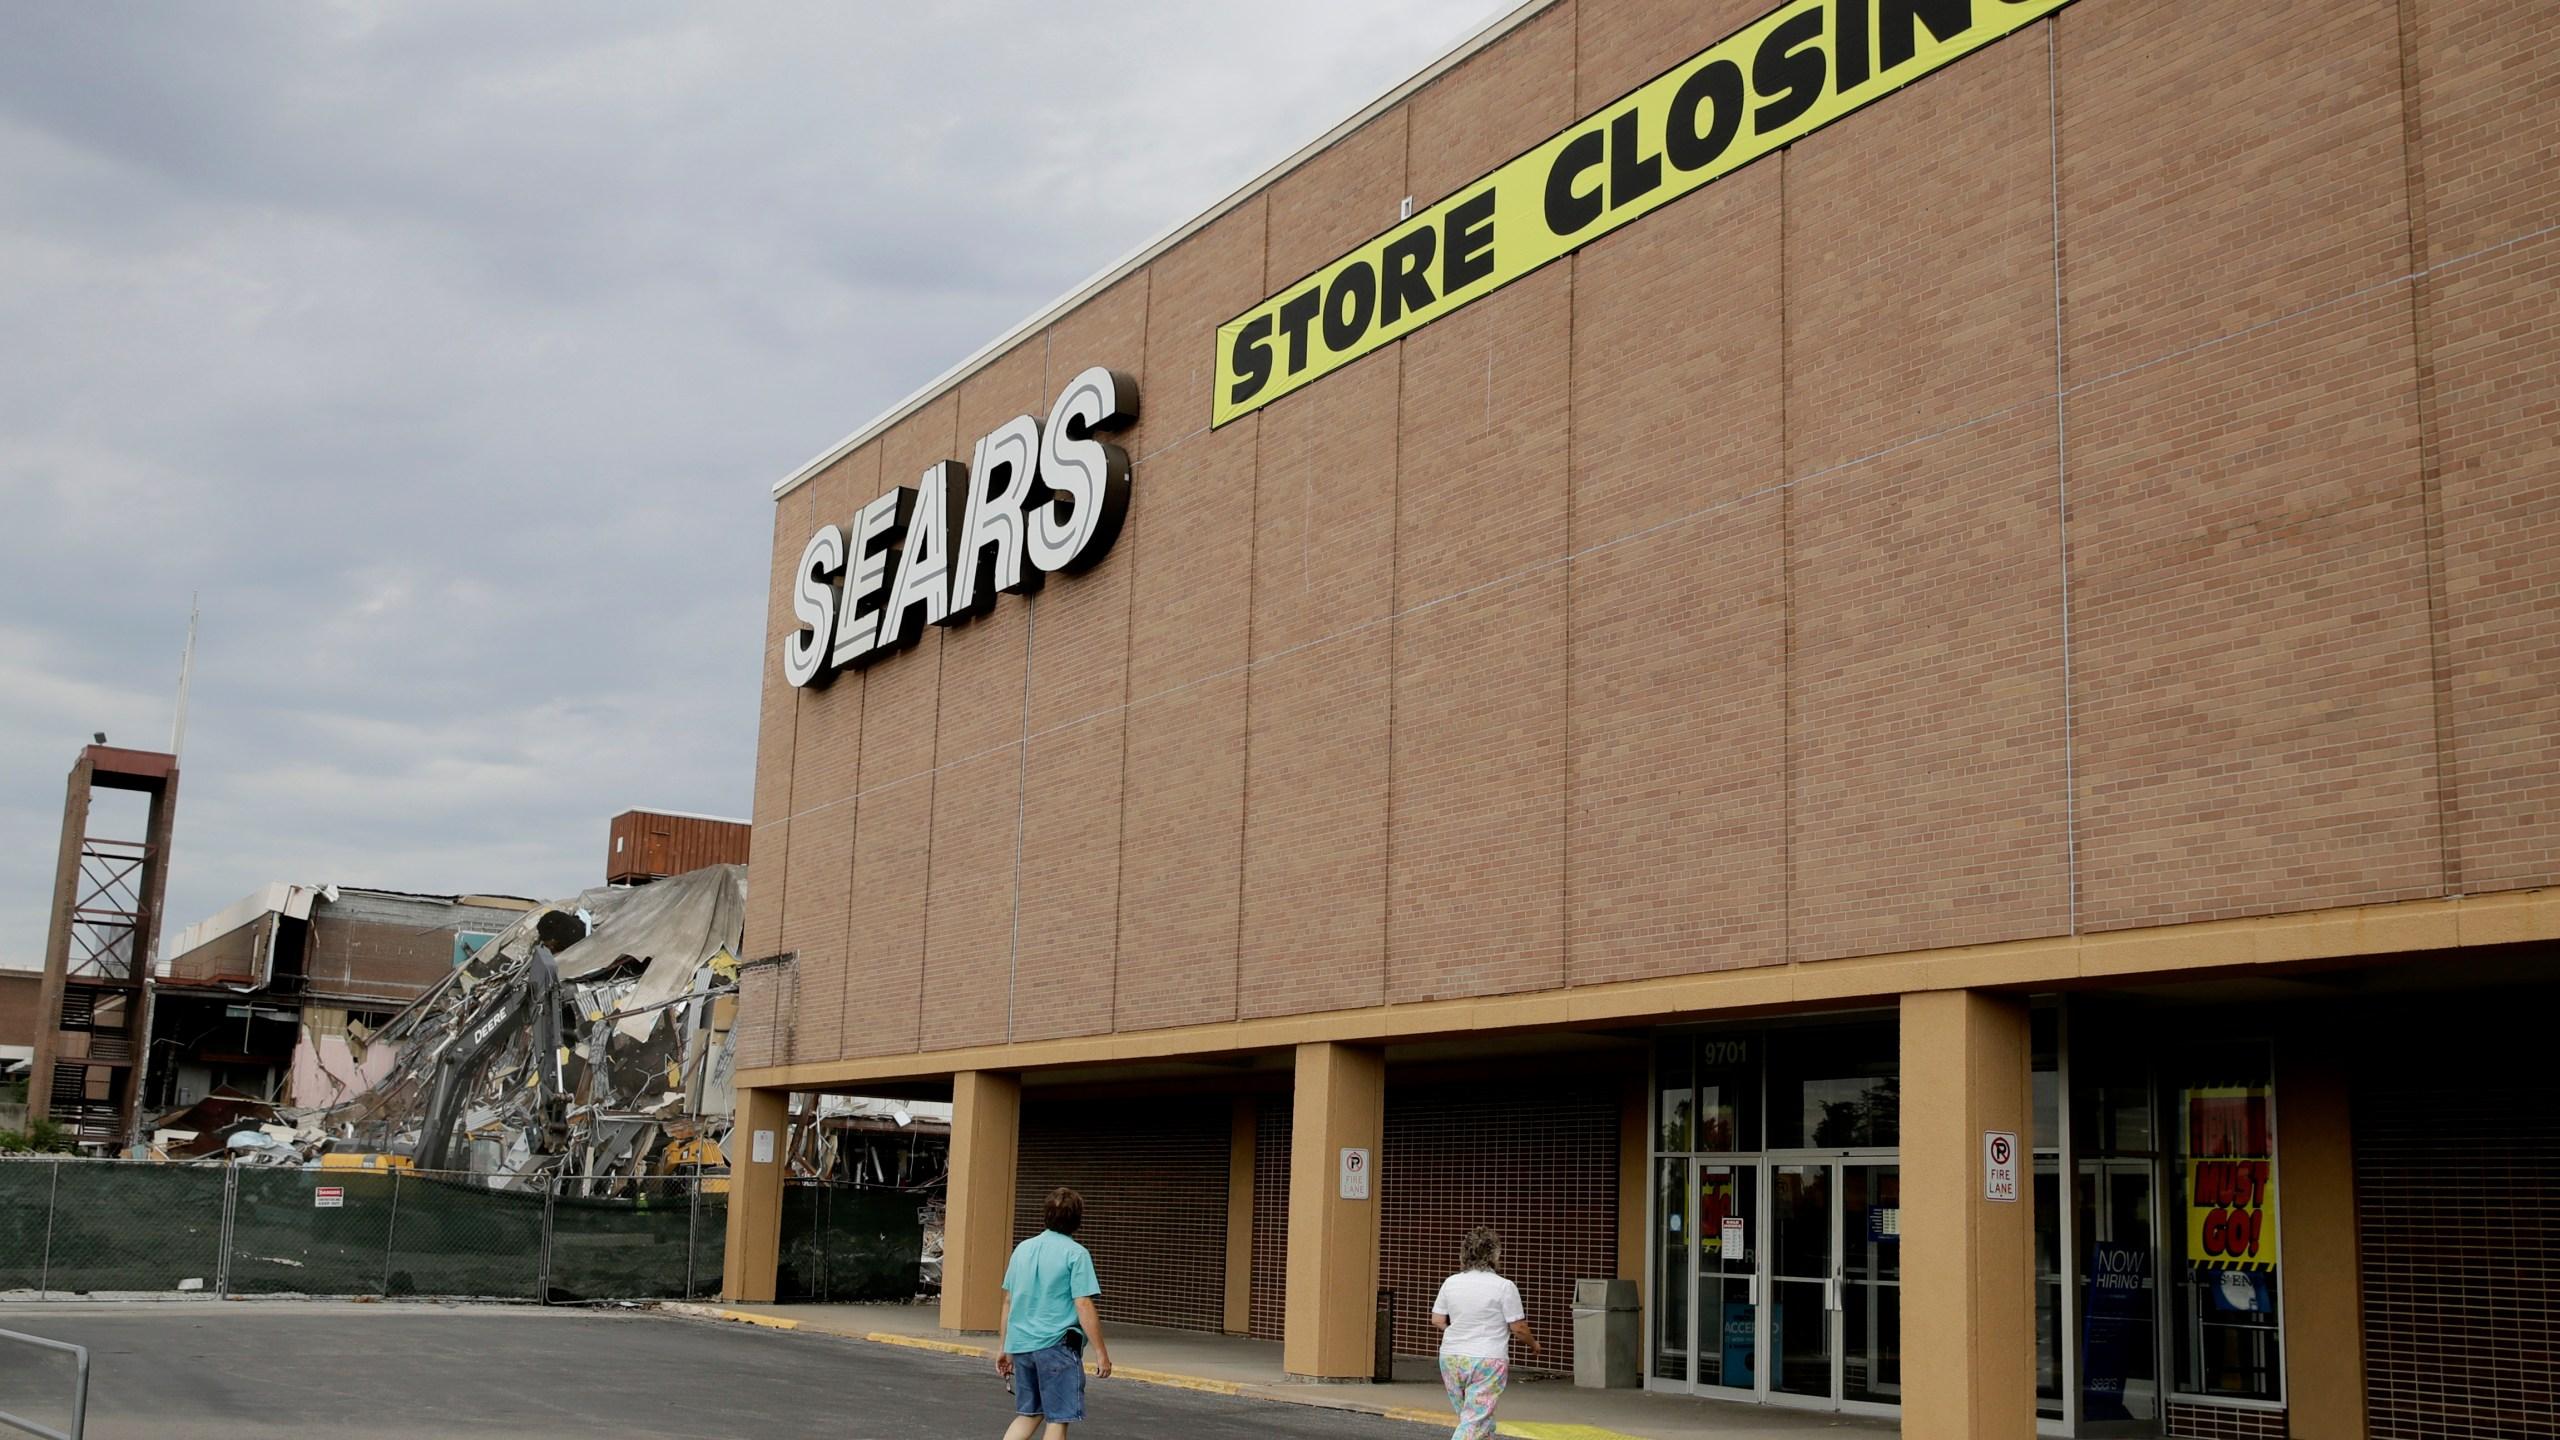 Sears_25780-159532.jpg53596594